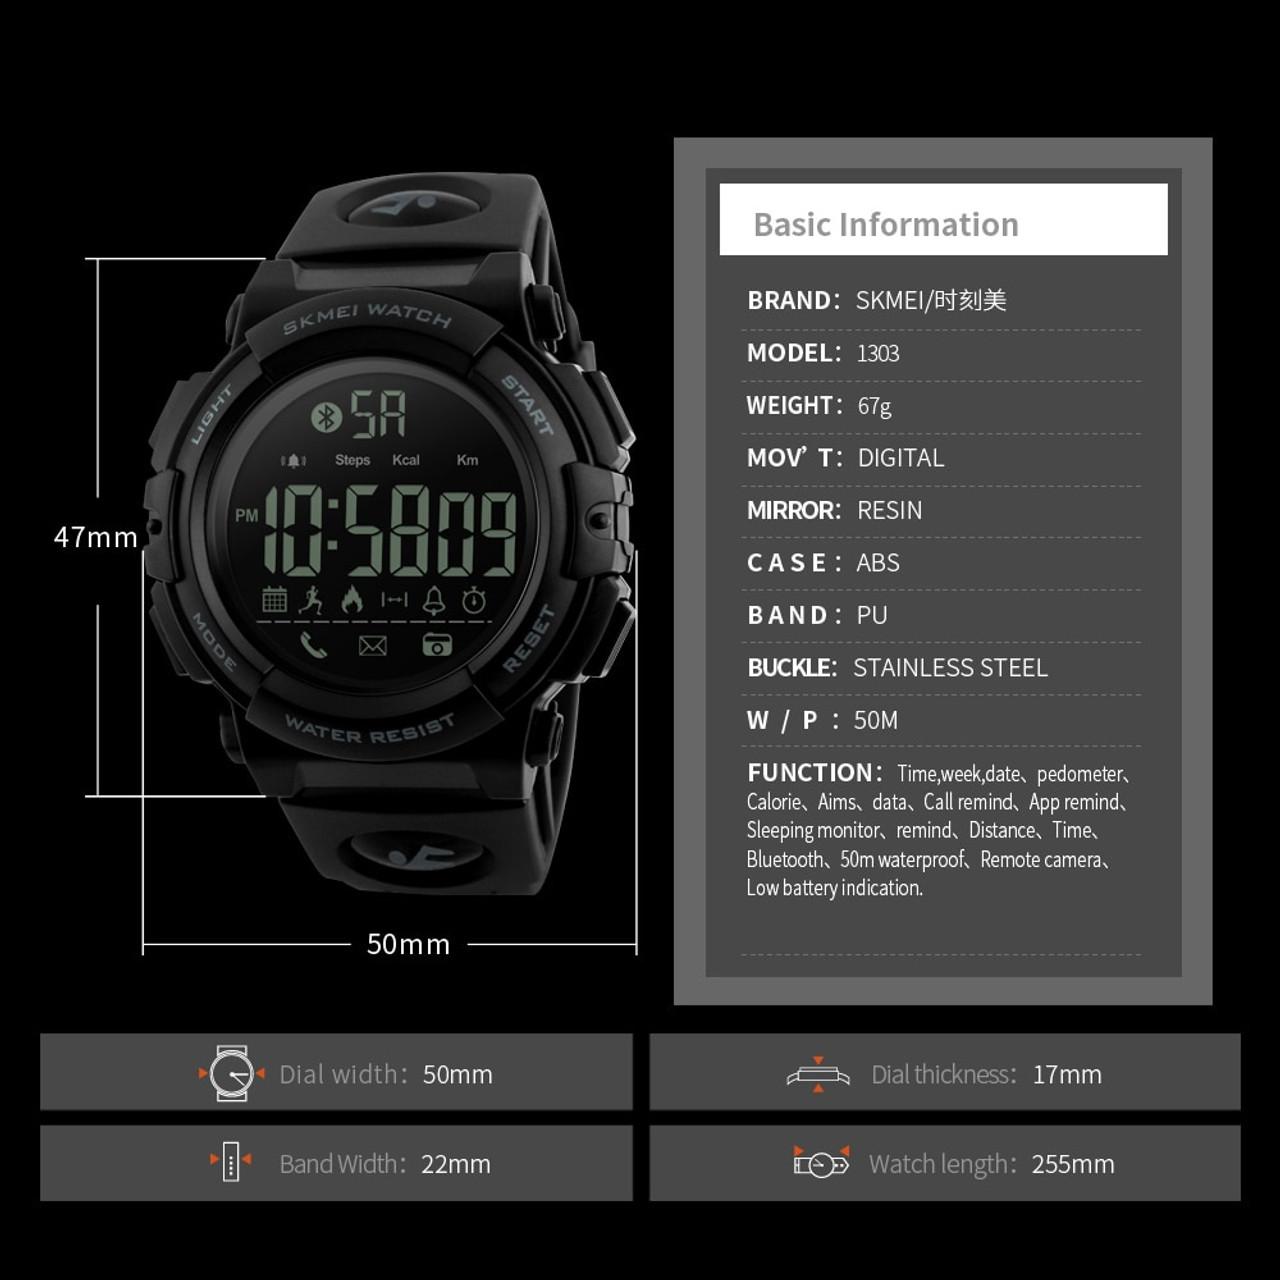 95a5f43e82f ... SKMEI Bluetooth Smart Watch Fashion Outdoor Pedometer Calories Remote  Camera Sports Watches 50M Waterproof Digital Wristwatches ...